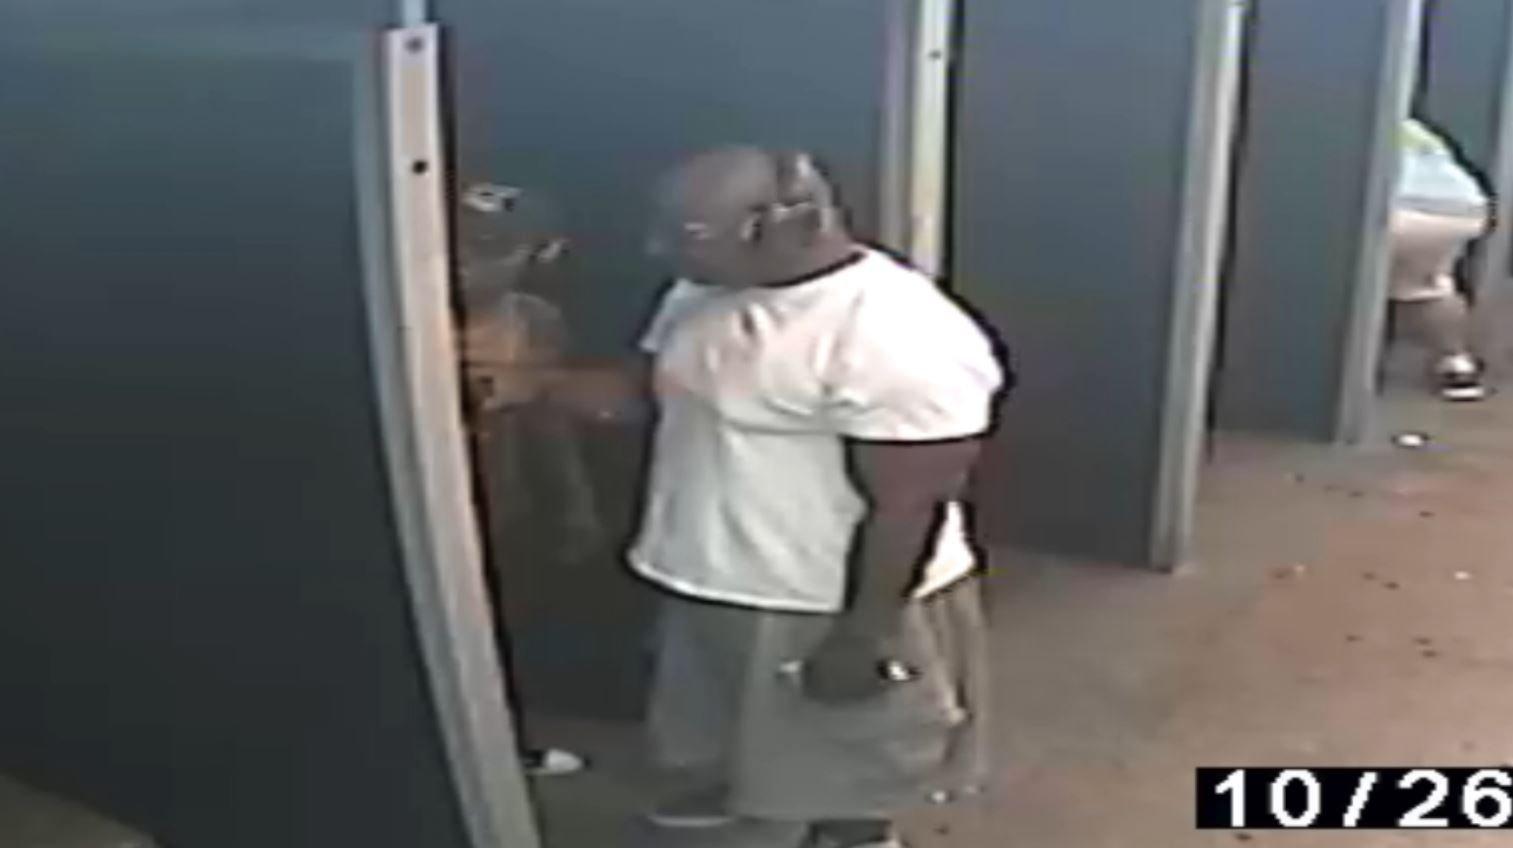 Jevon and Dori Hudson at a gun range hours after Moinee Wade's murder